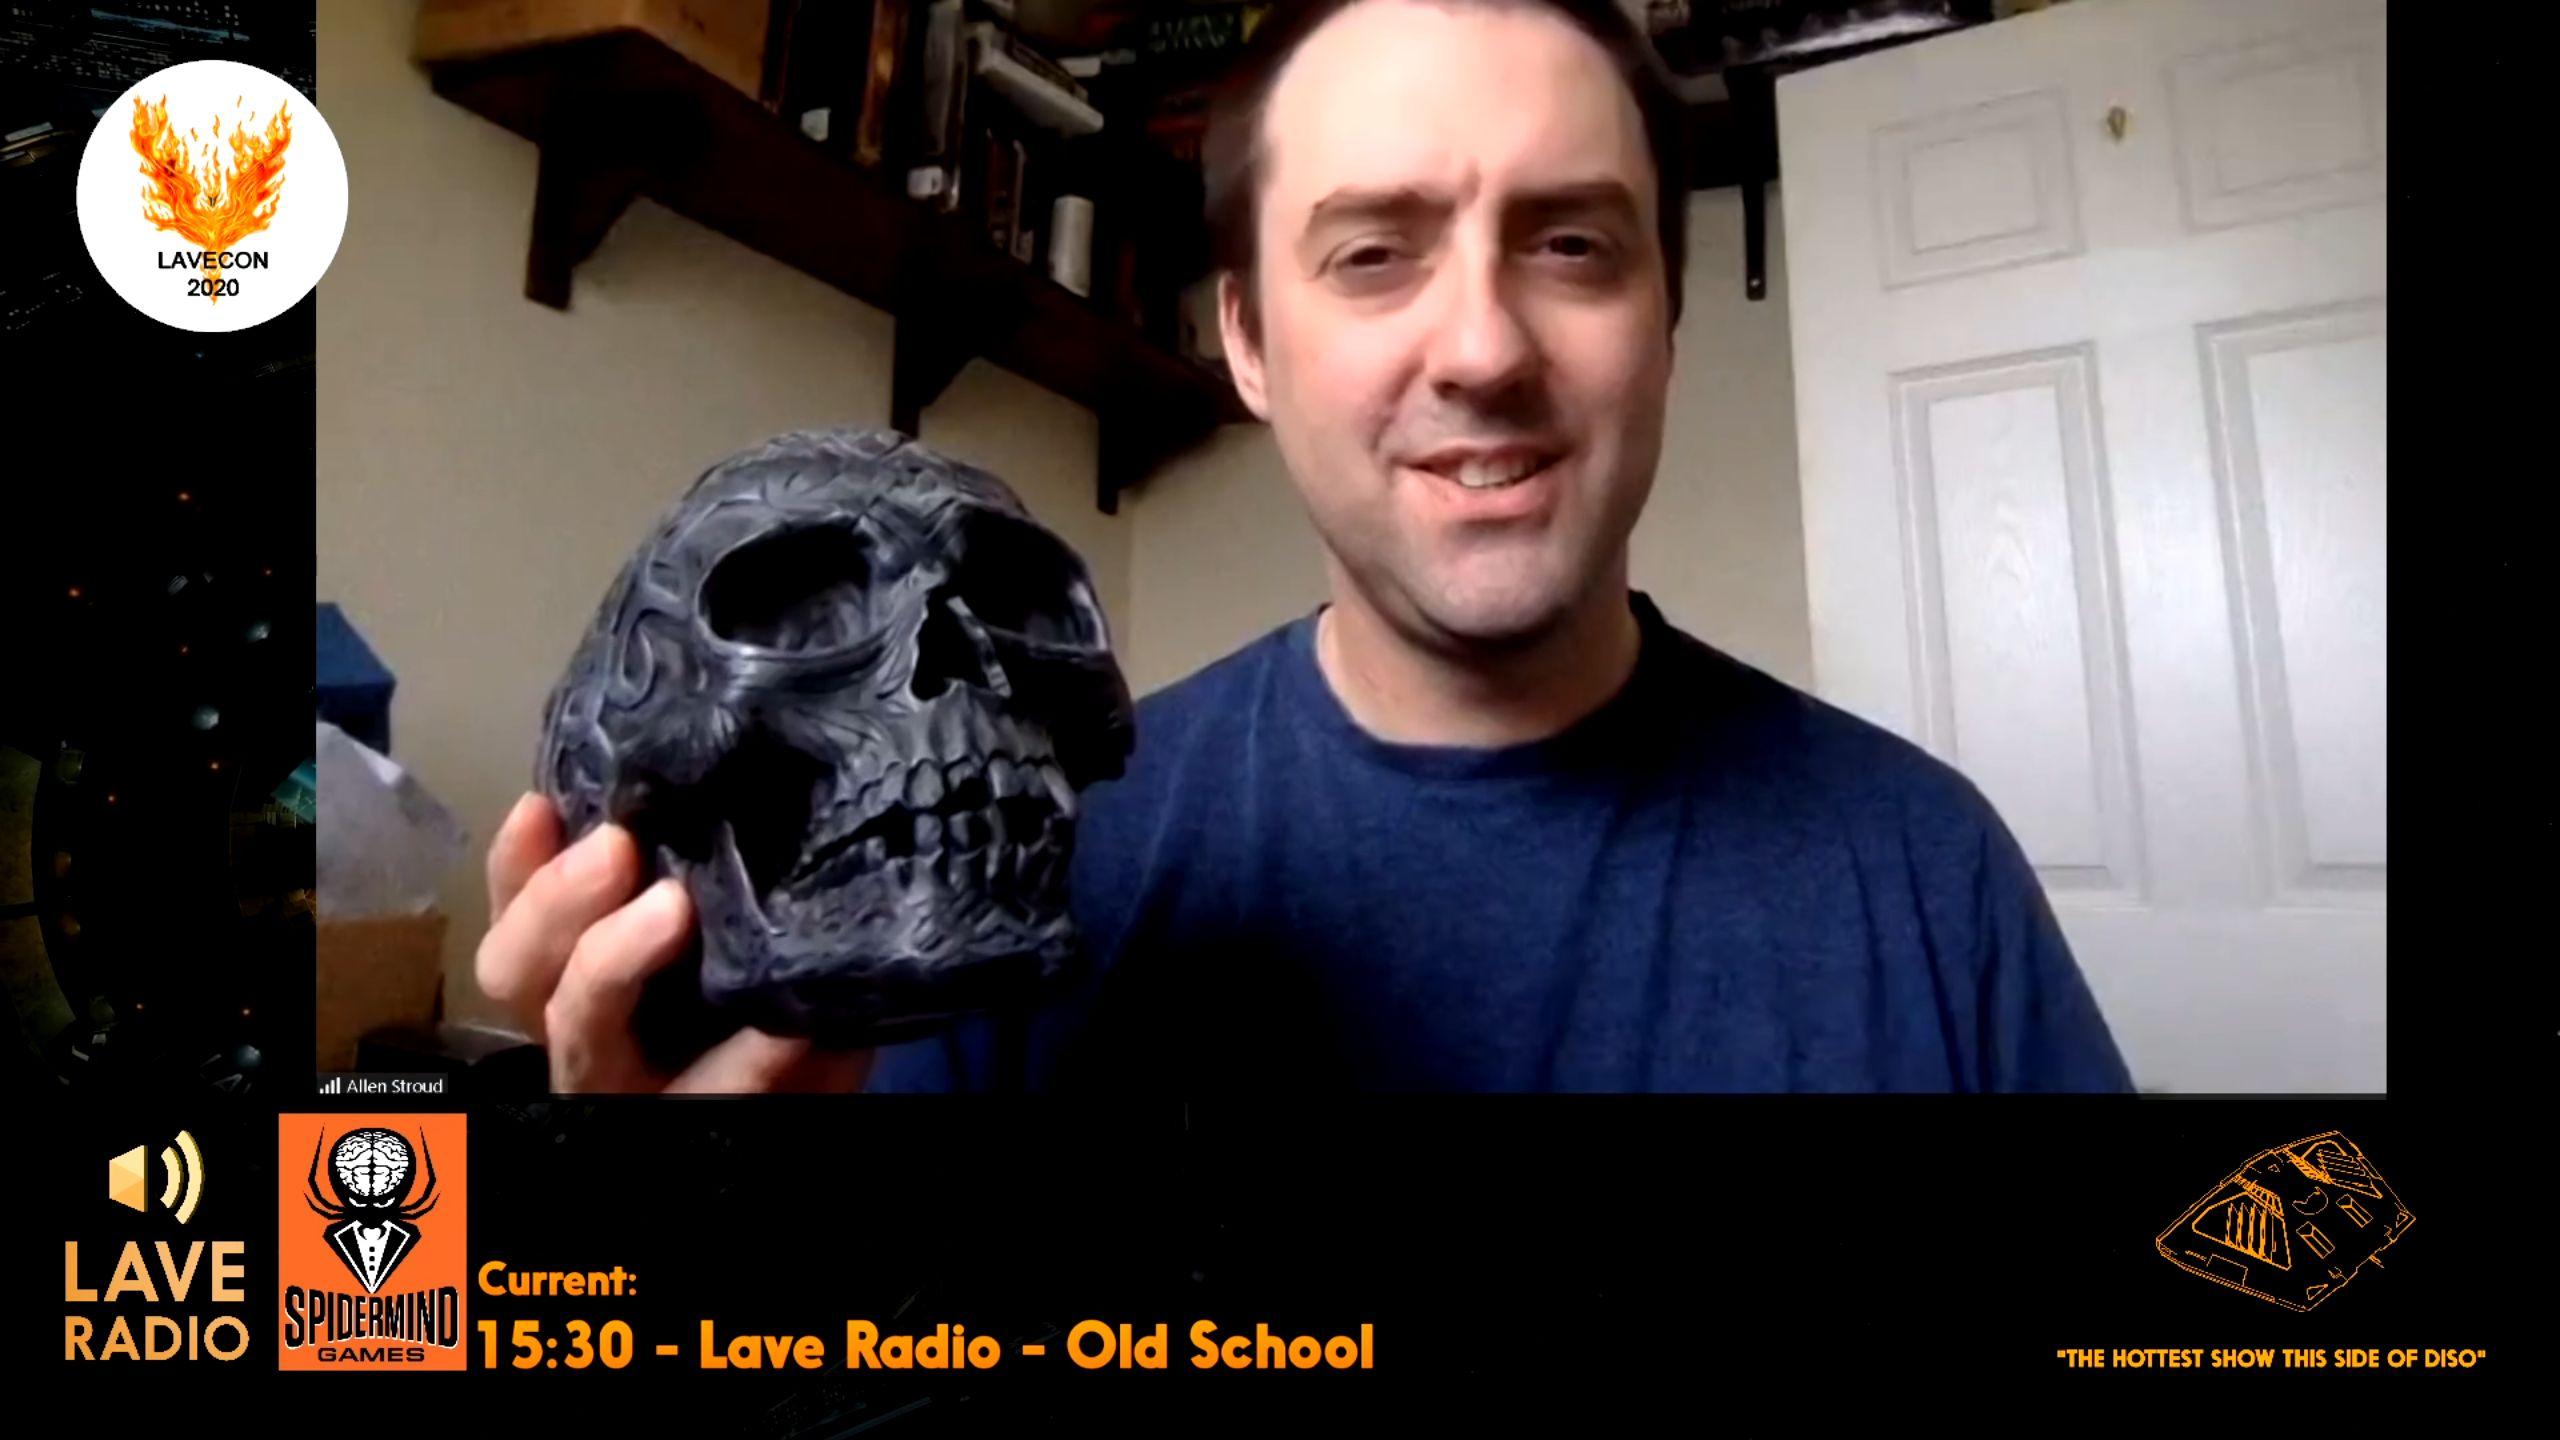 laveRadio-old-school.jpg